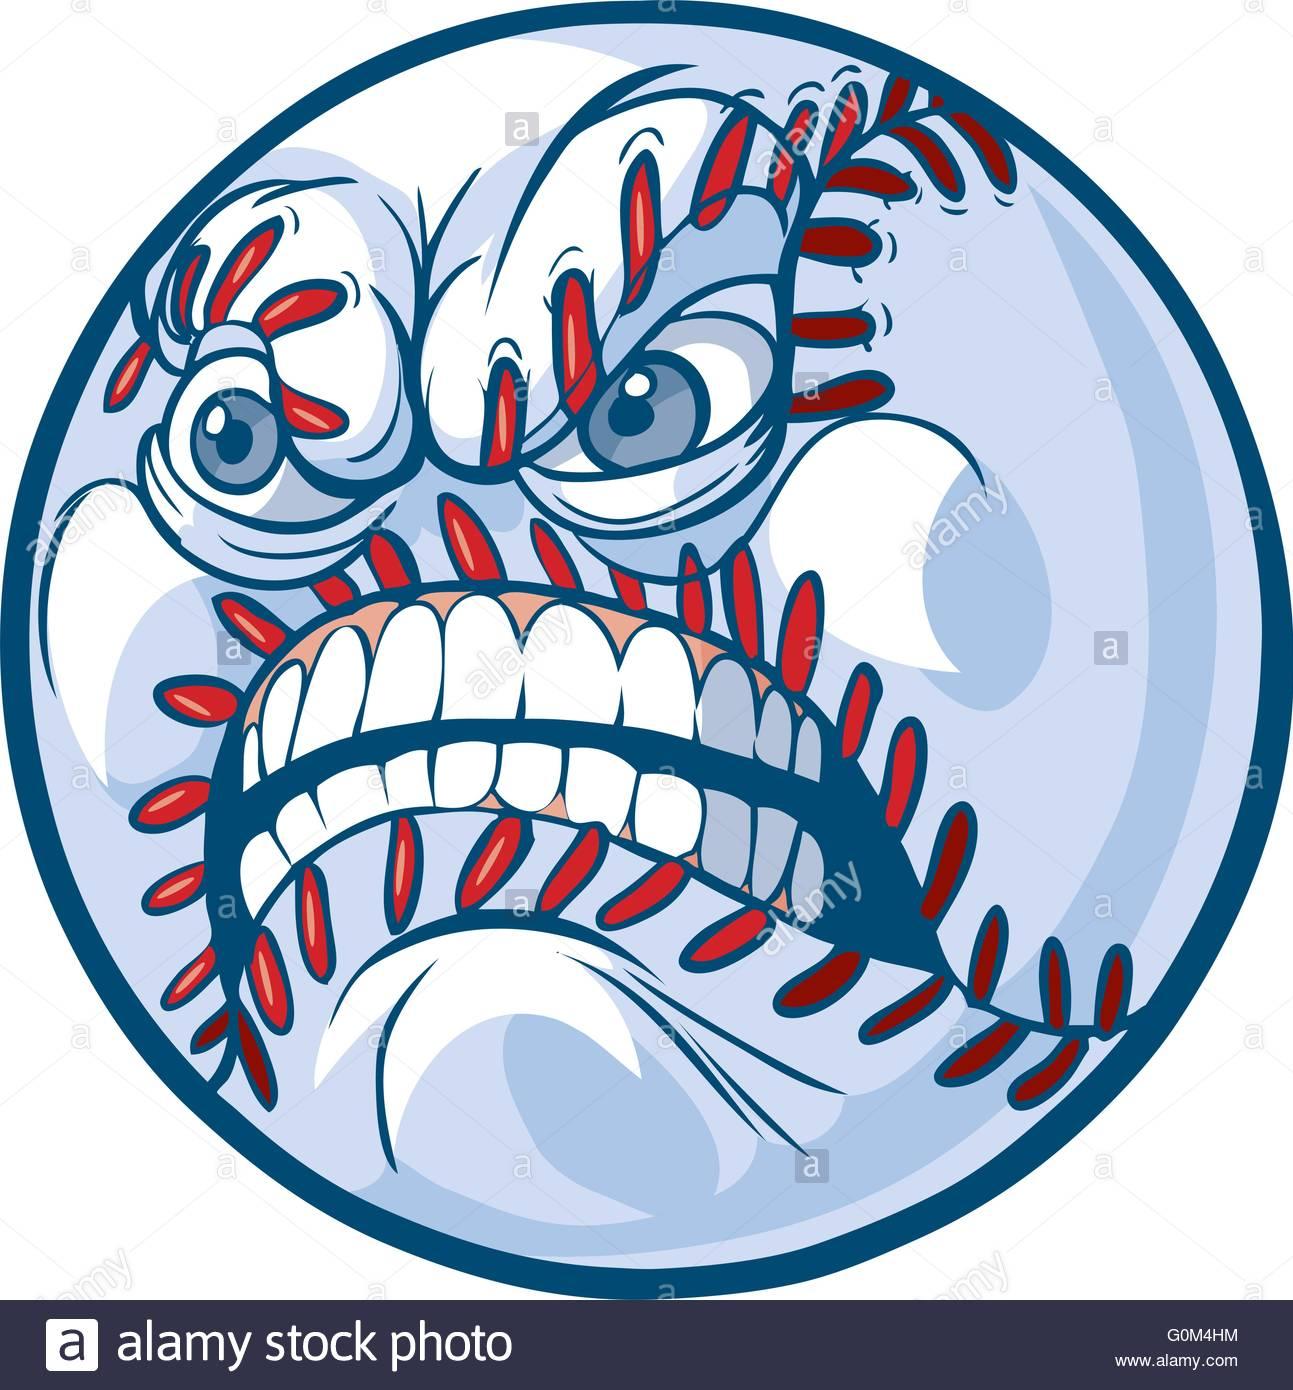 1293x1390 Vector Cartoon Clip Art Illustration Of A Baseball Or Softball